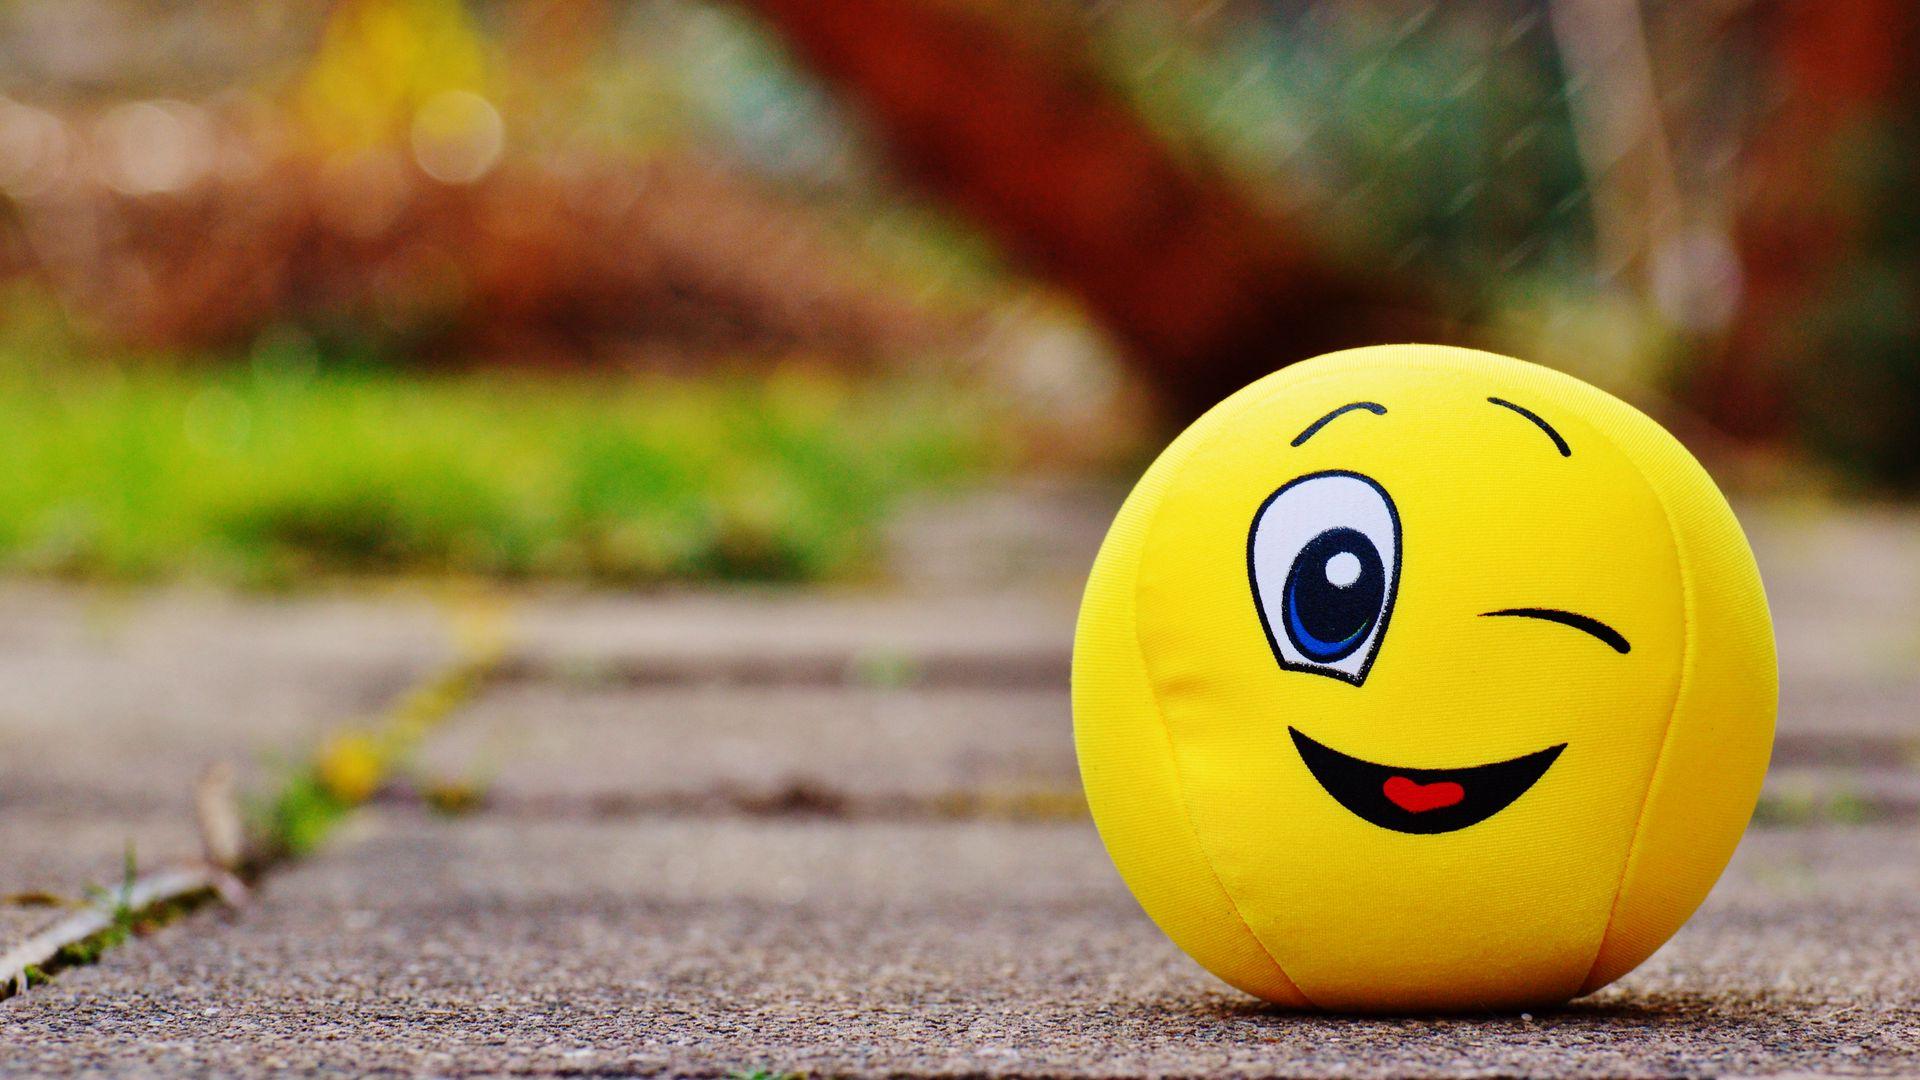 1920x1080 Wallpaper ball, smile, happy, toy